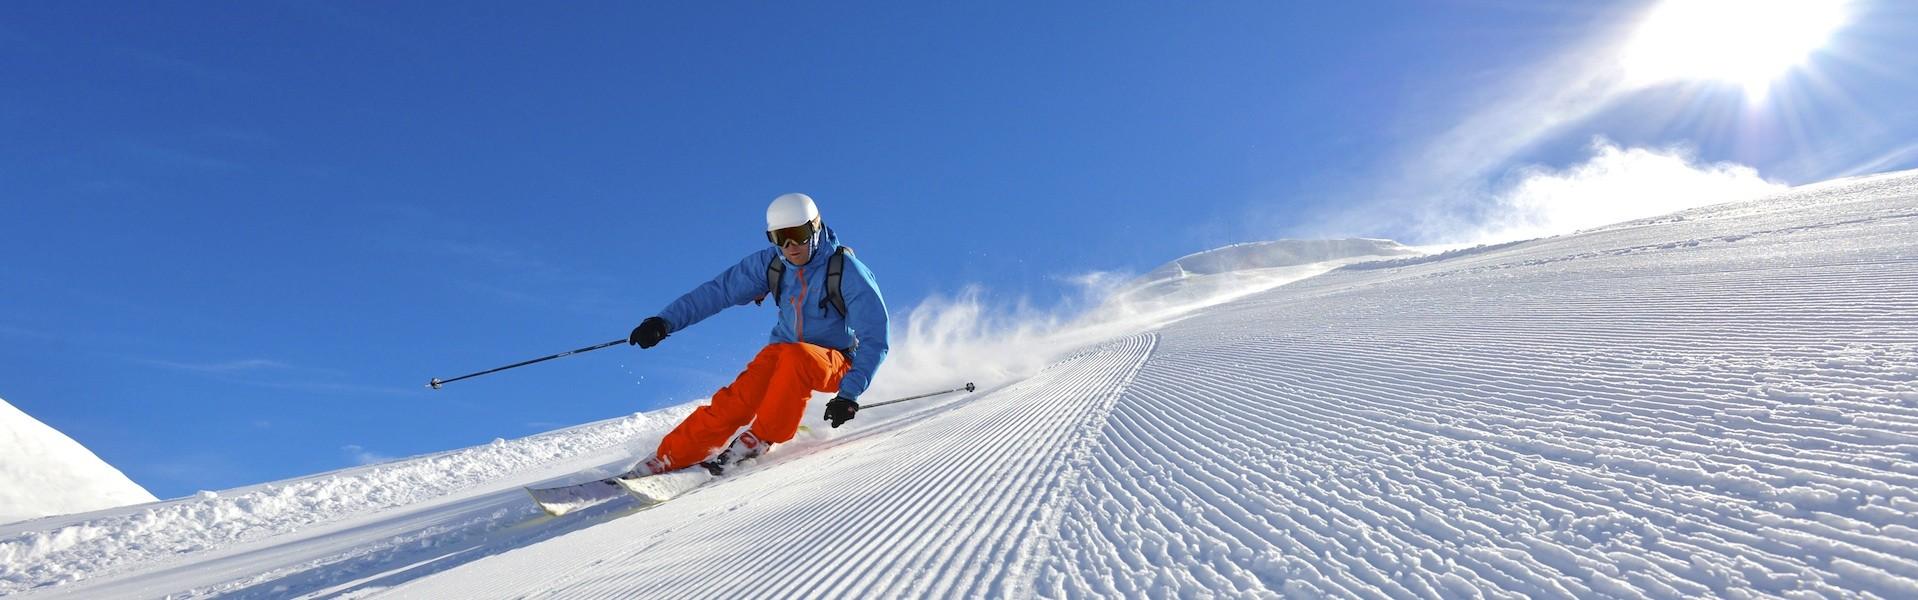 ski-david-machet-2899